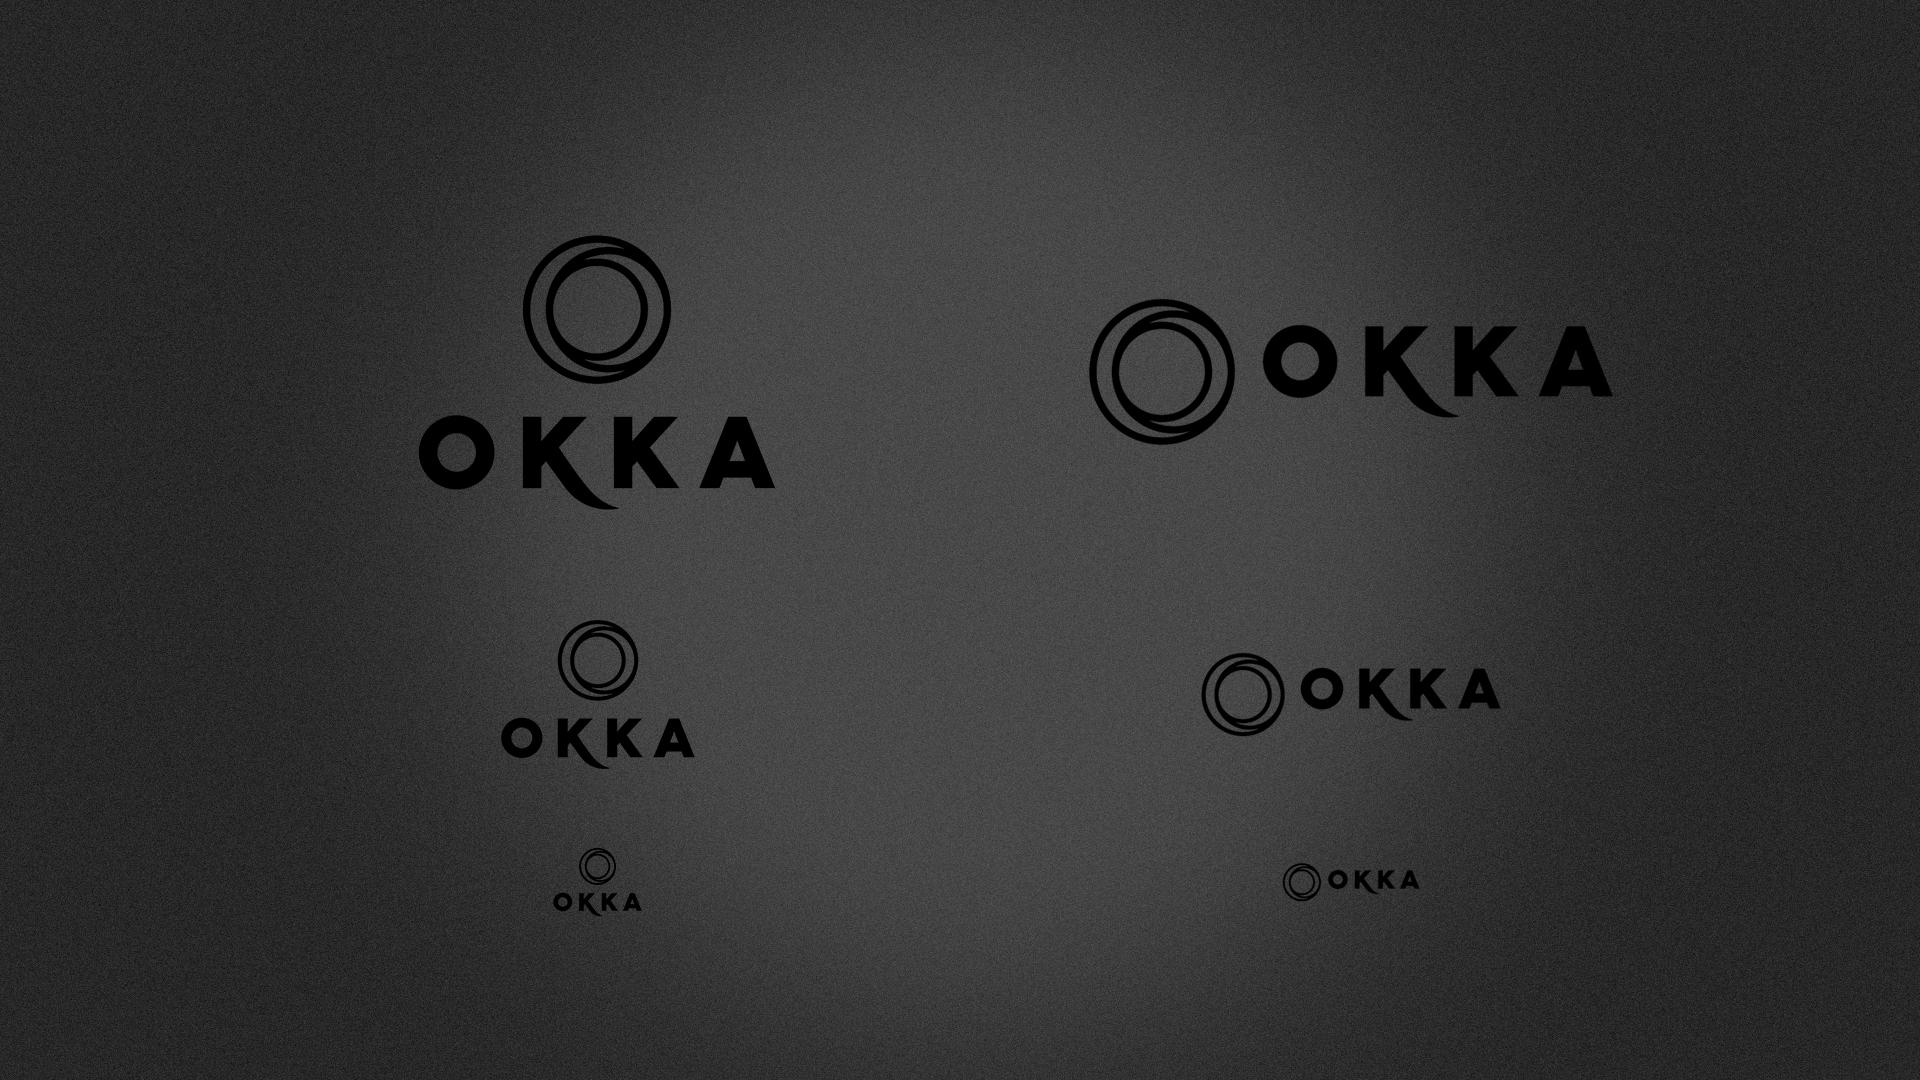 okka-logo-type8